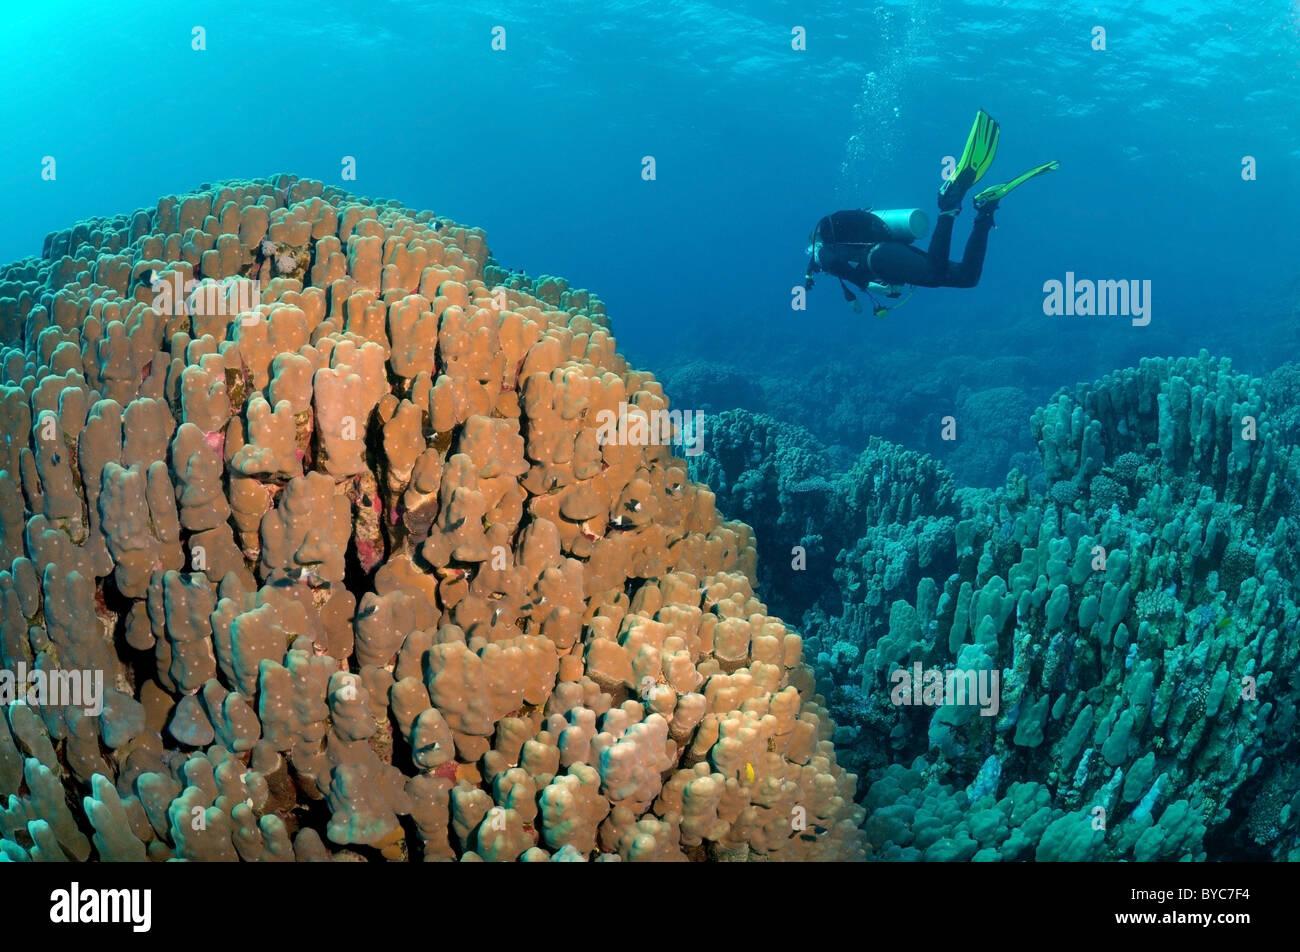 Scuba diver swim in the blue water near beautiful coral reef Stock Photo